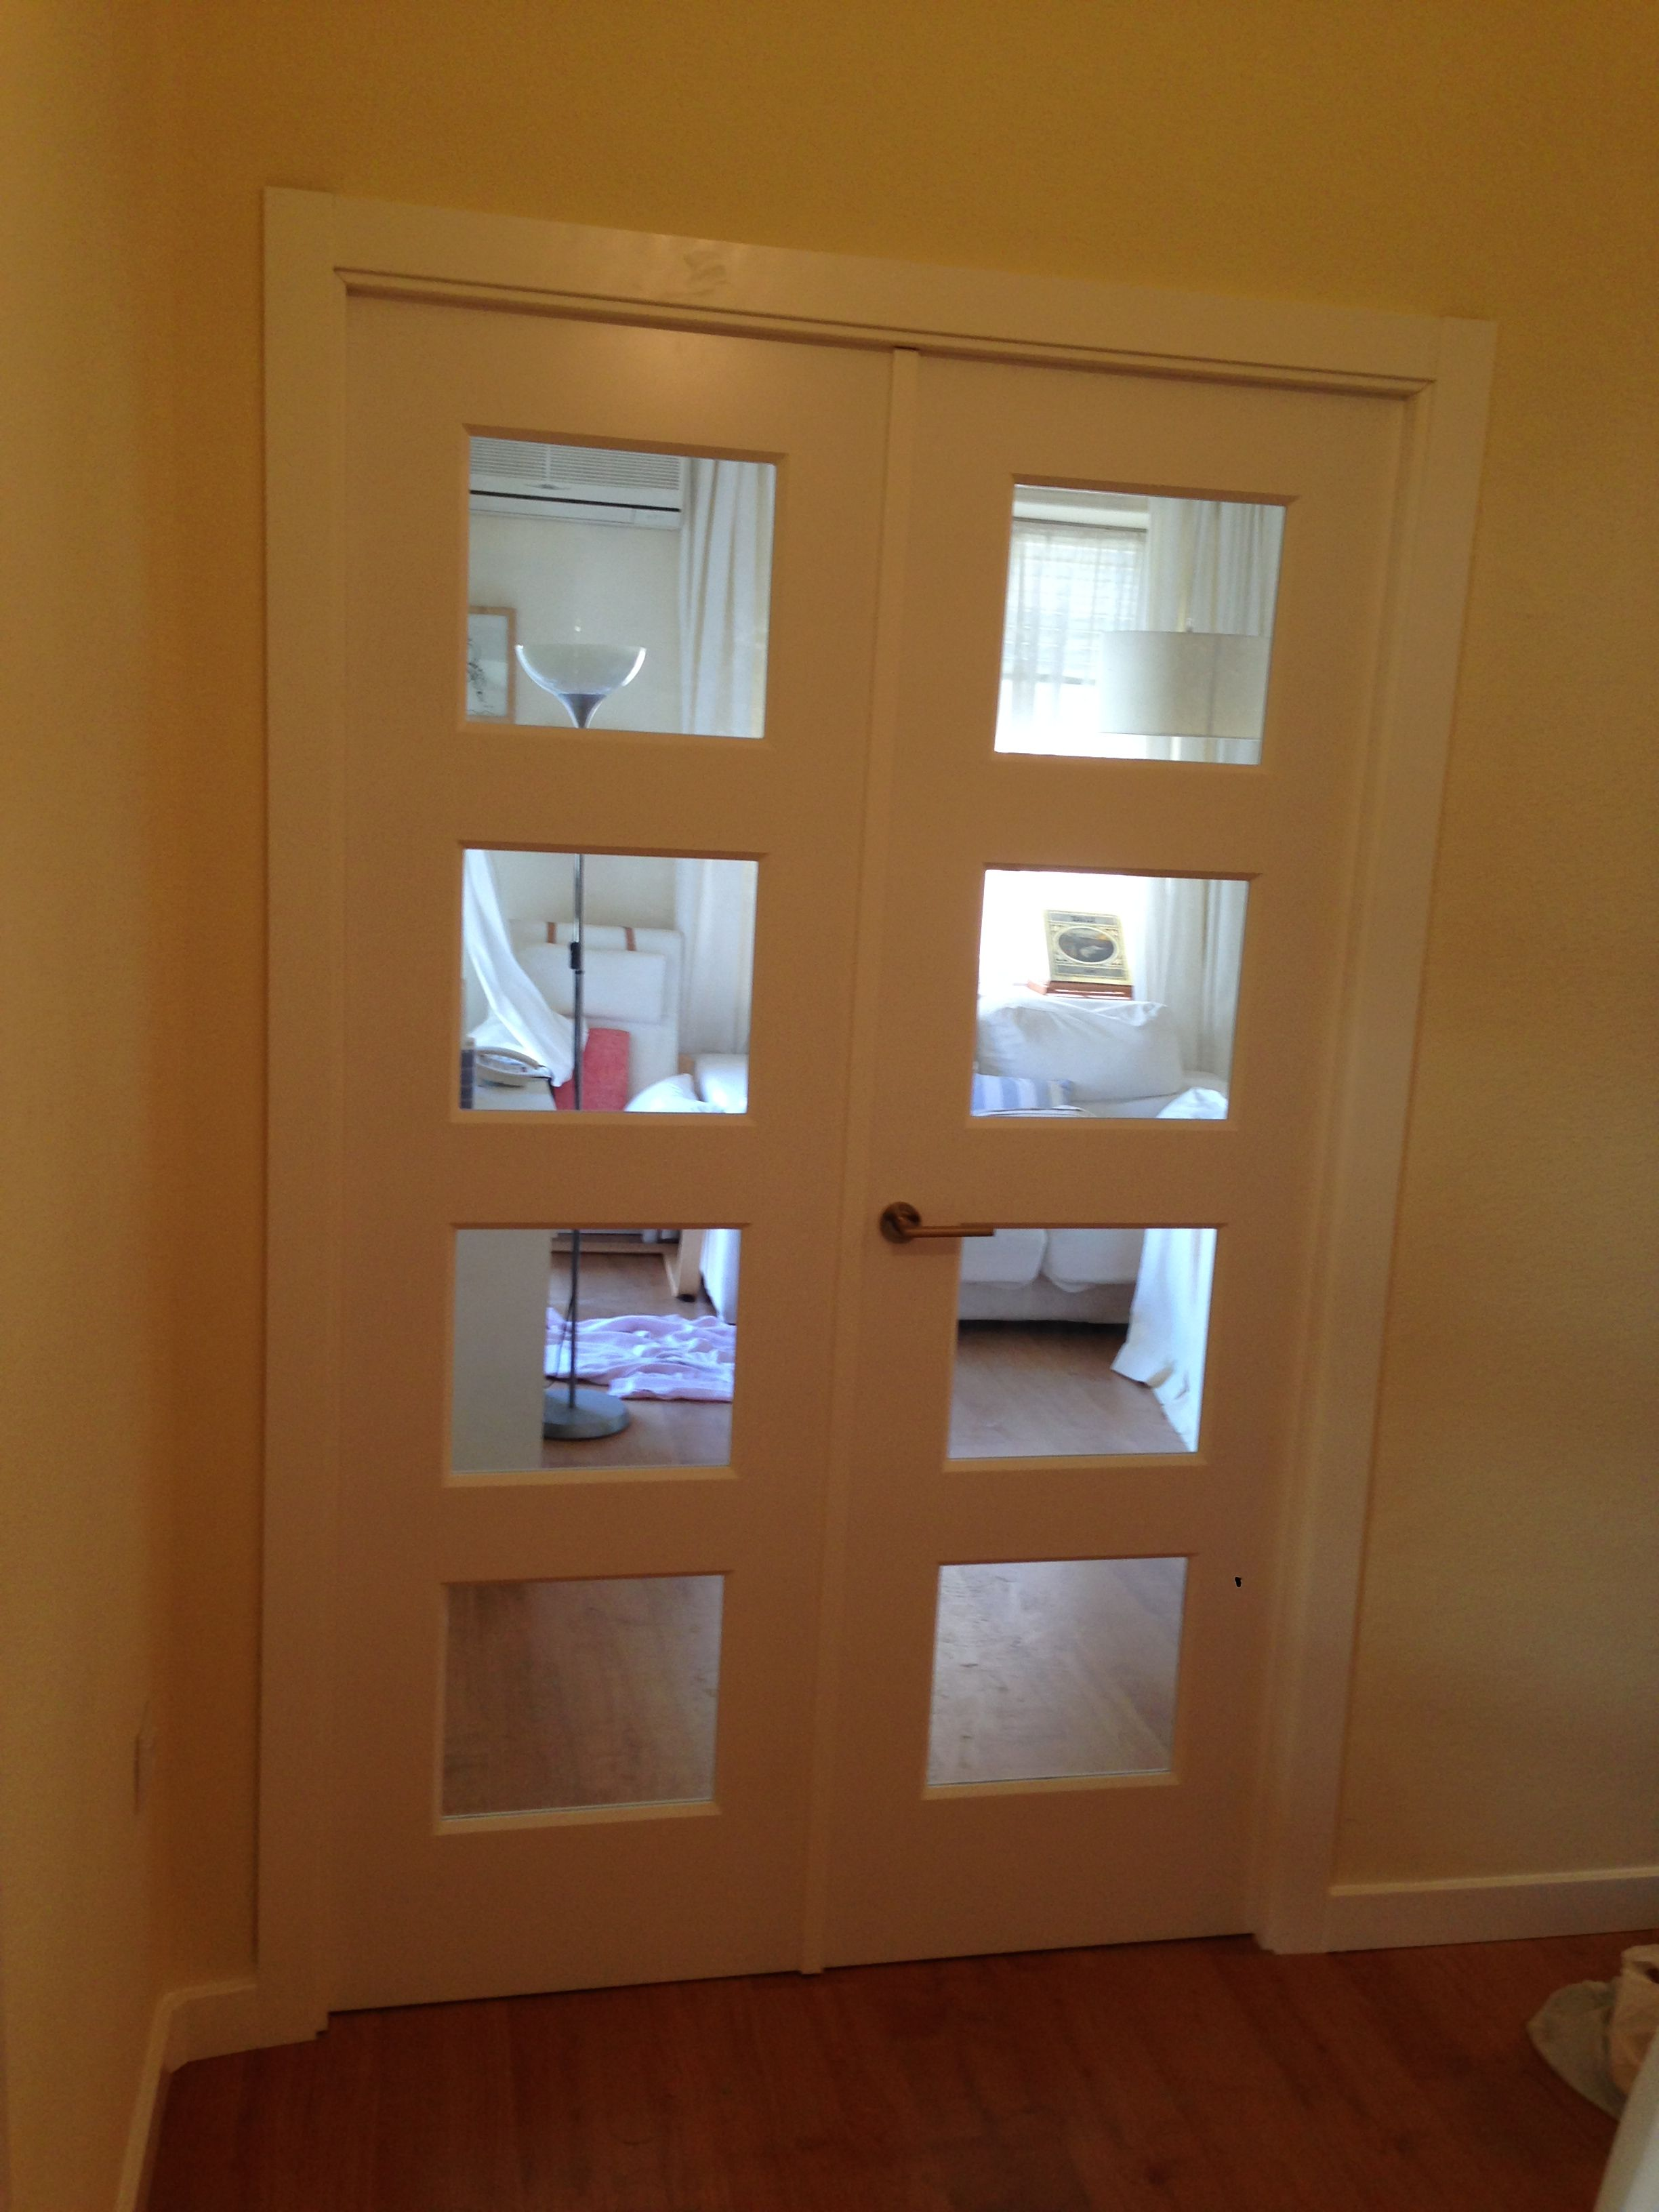 Puerta doble modelo bosco v4 cristal transparentetarima for Puerta doble madera